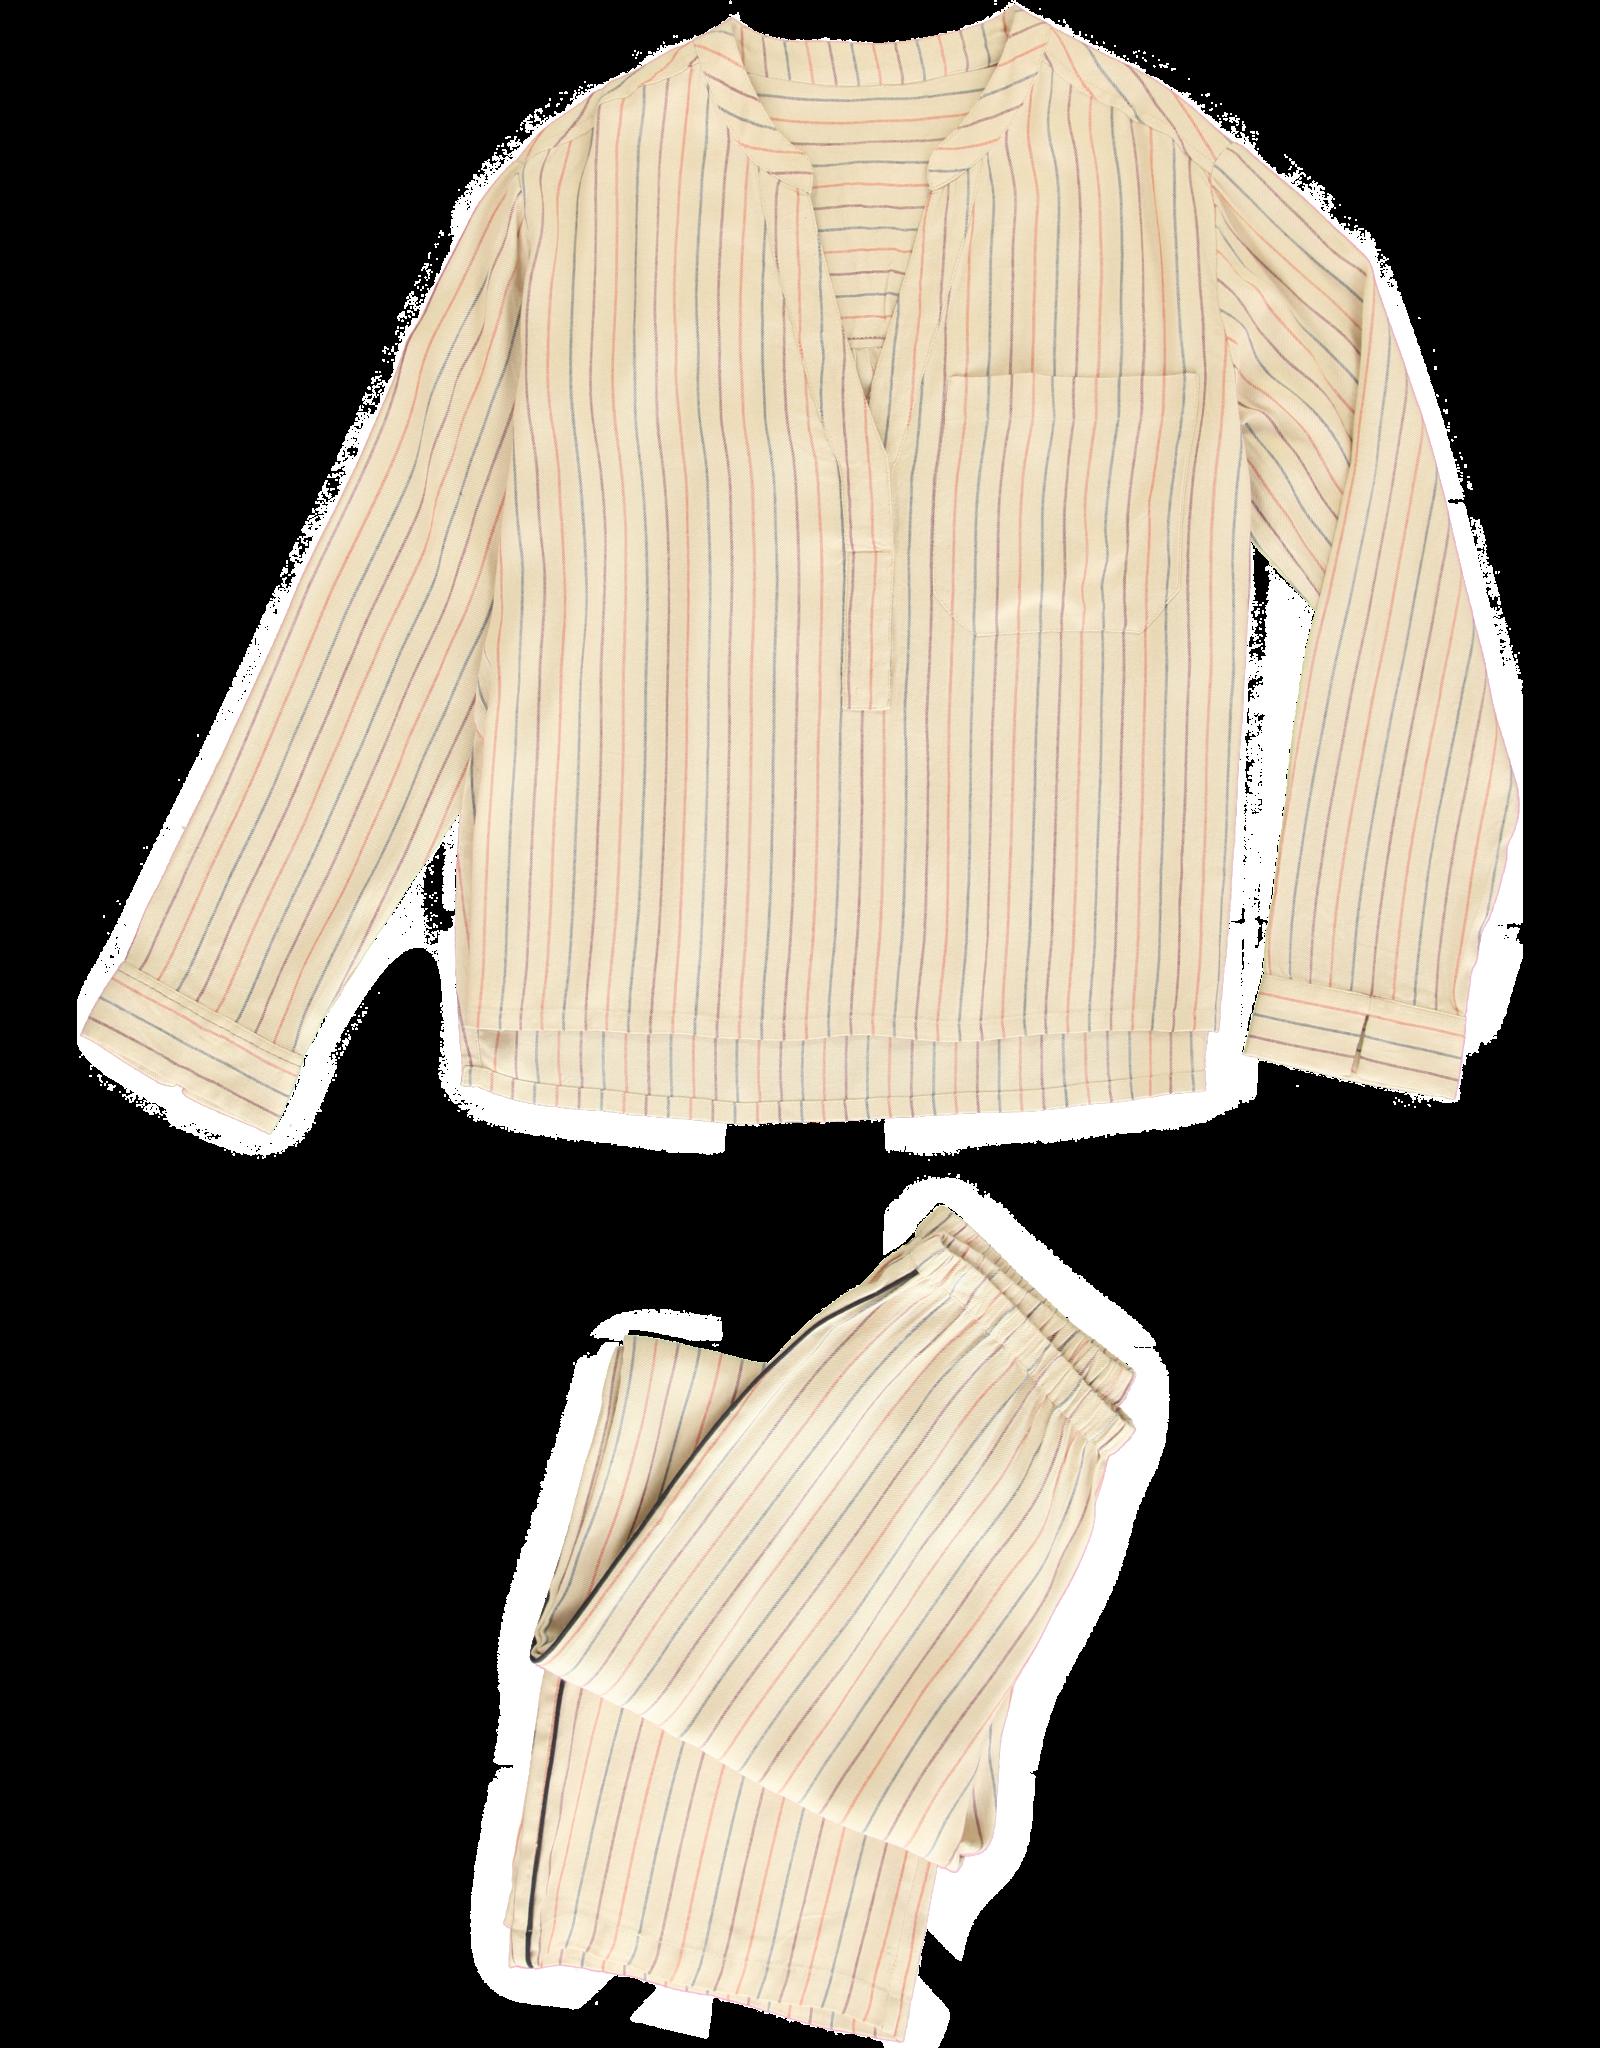 Dorélit Dione + Deneb | Pajama Set Woven | Beige